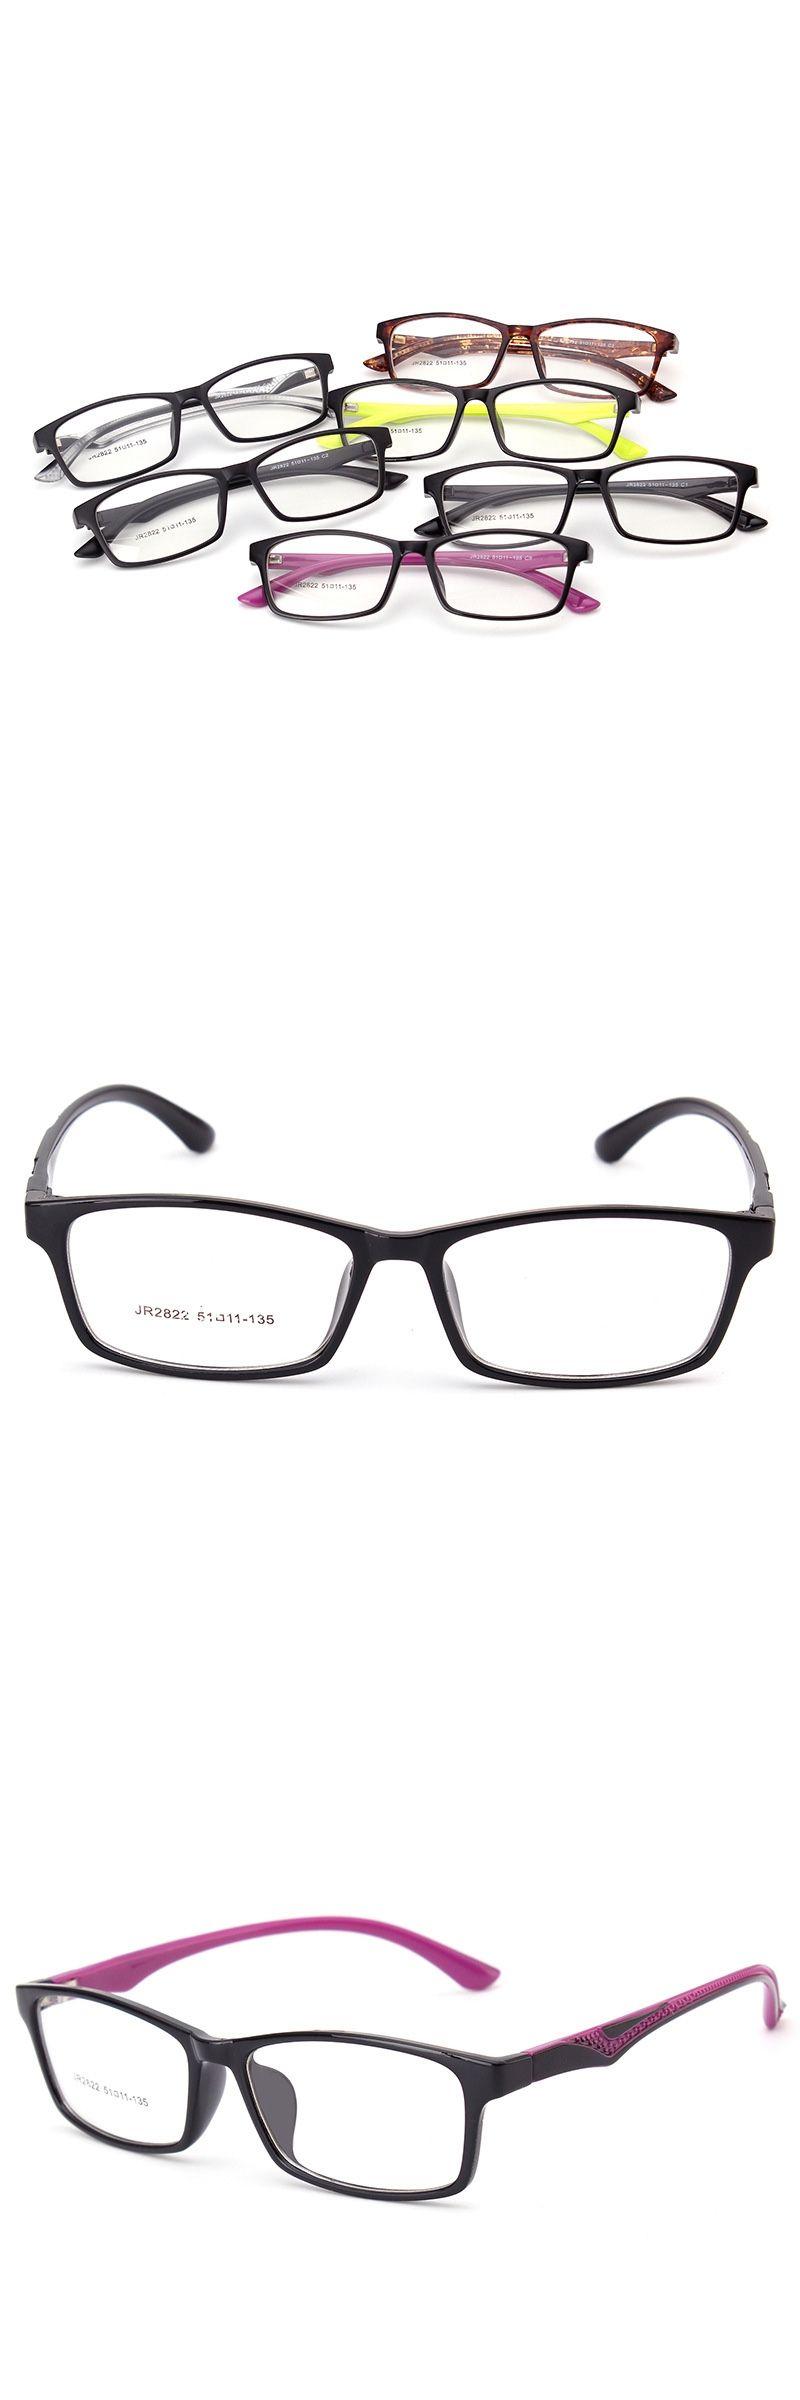 9bb447b9e93 2016 Fashion Ultra Light Students Eyeglasses Myopia Spectacle Frame Optical Prescription  Eyewear Frame Goggles